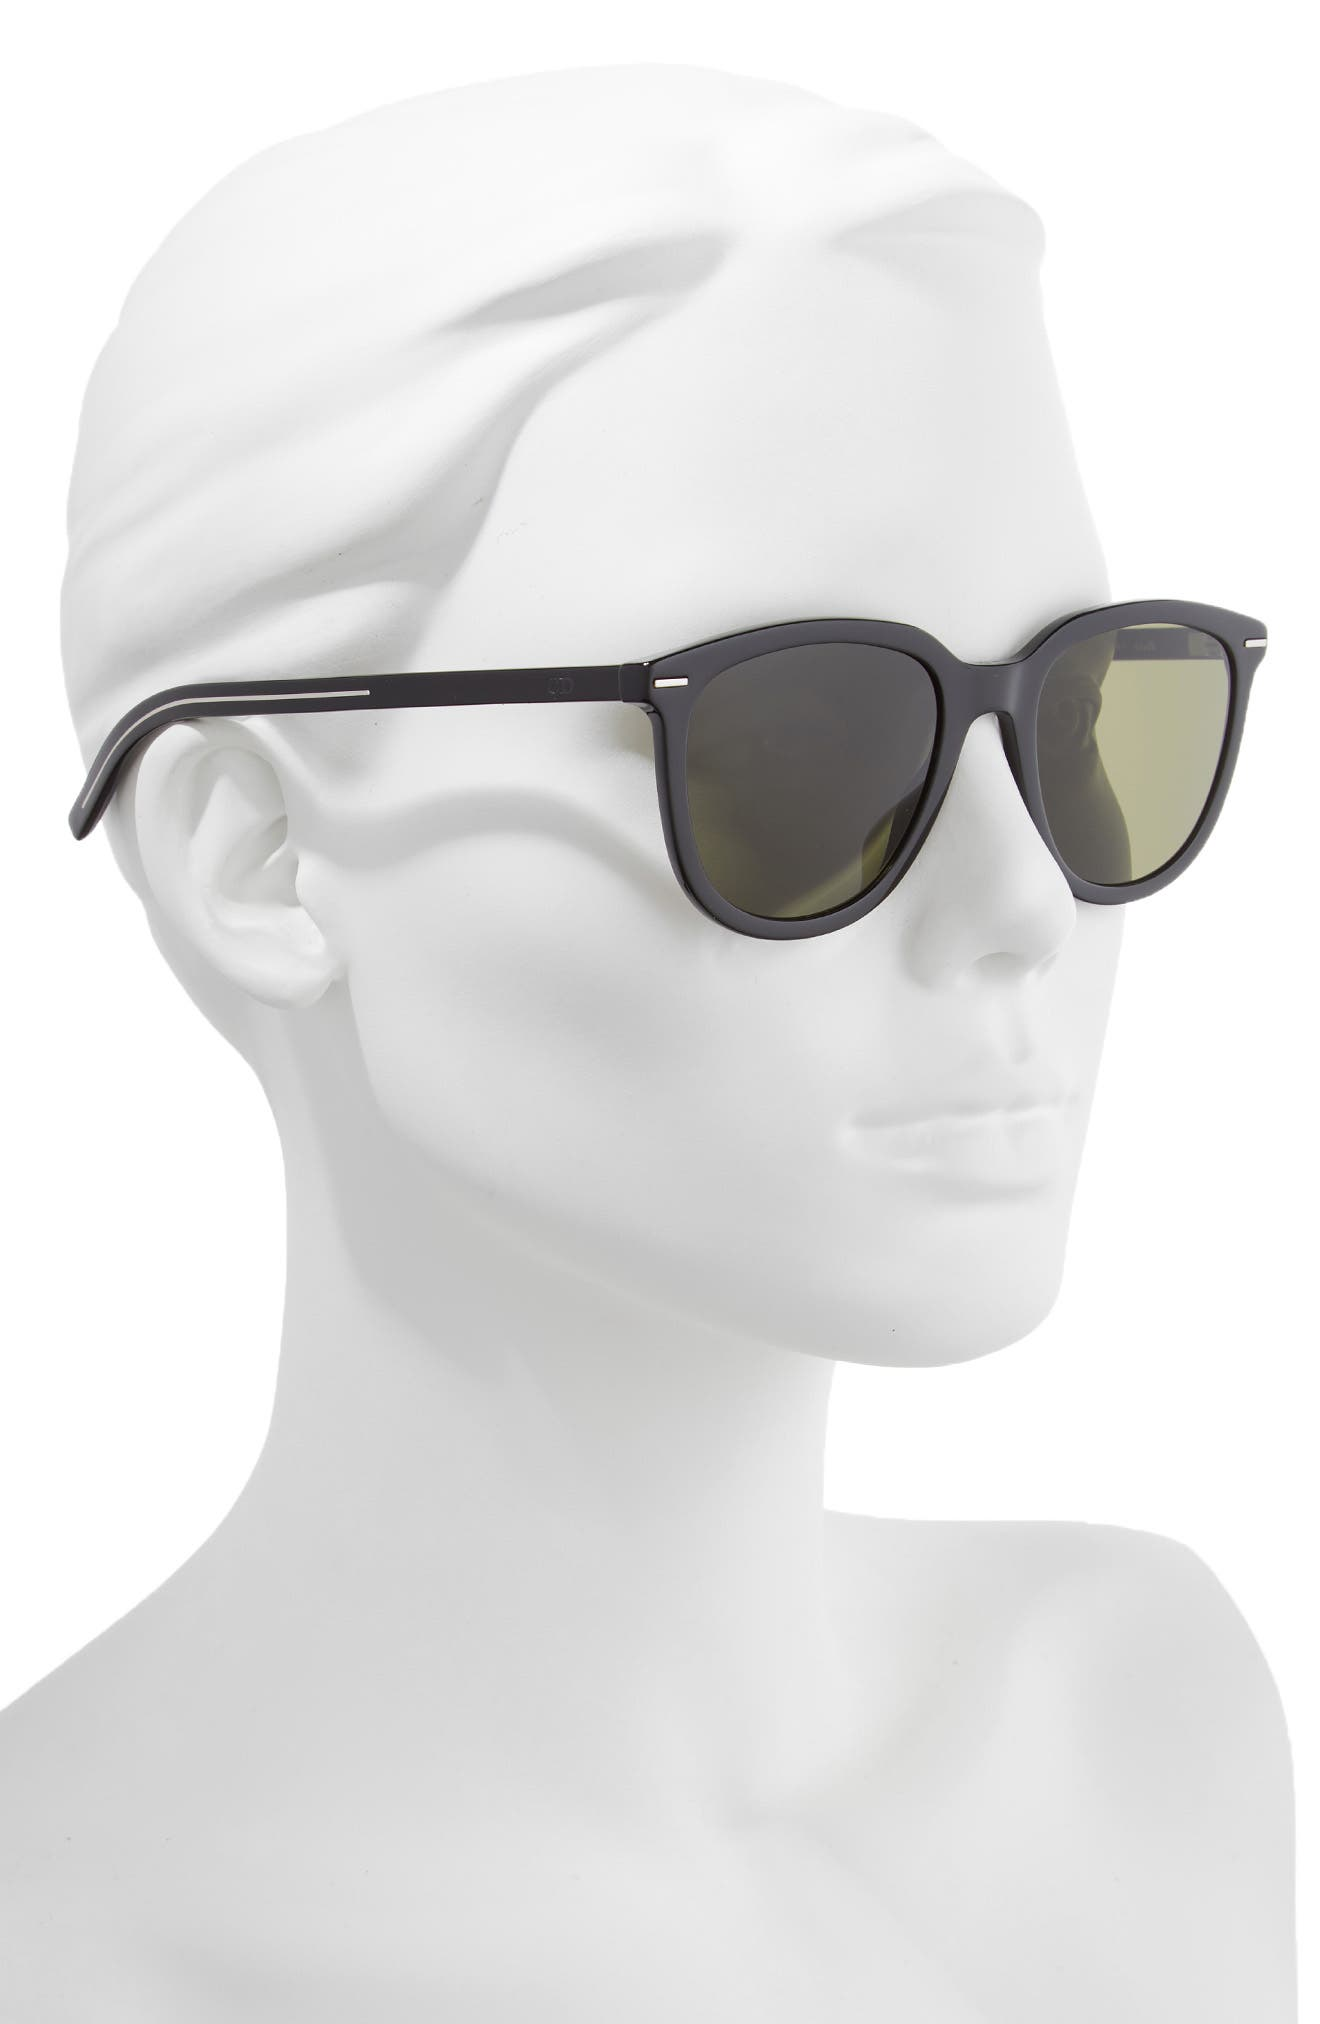 51mm Sunglasses,                             Alternate thumbnail 2, color,                             BLACK